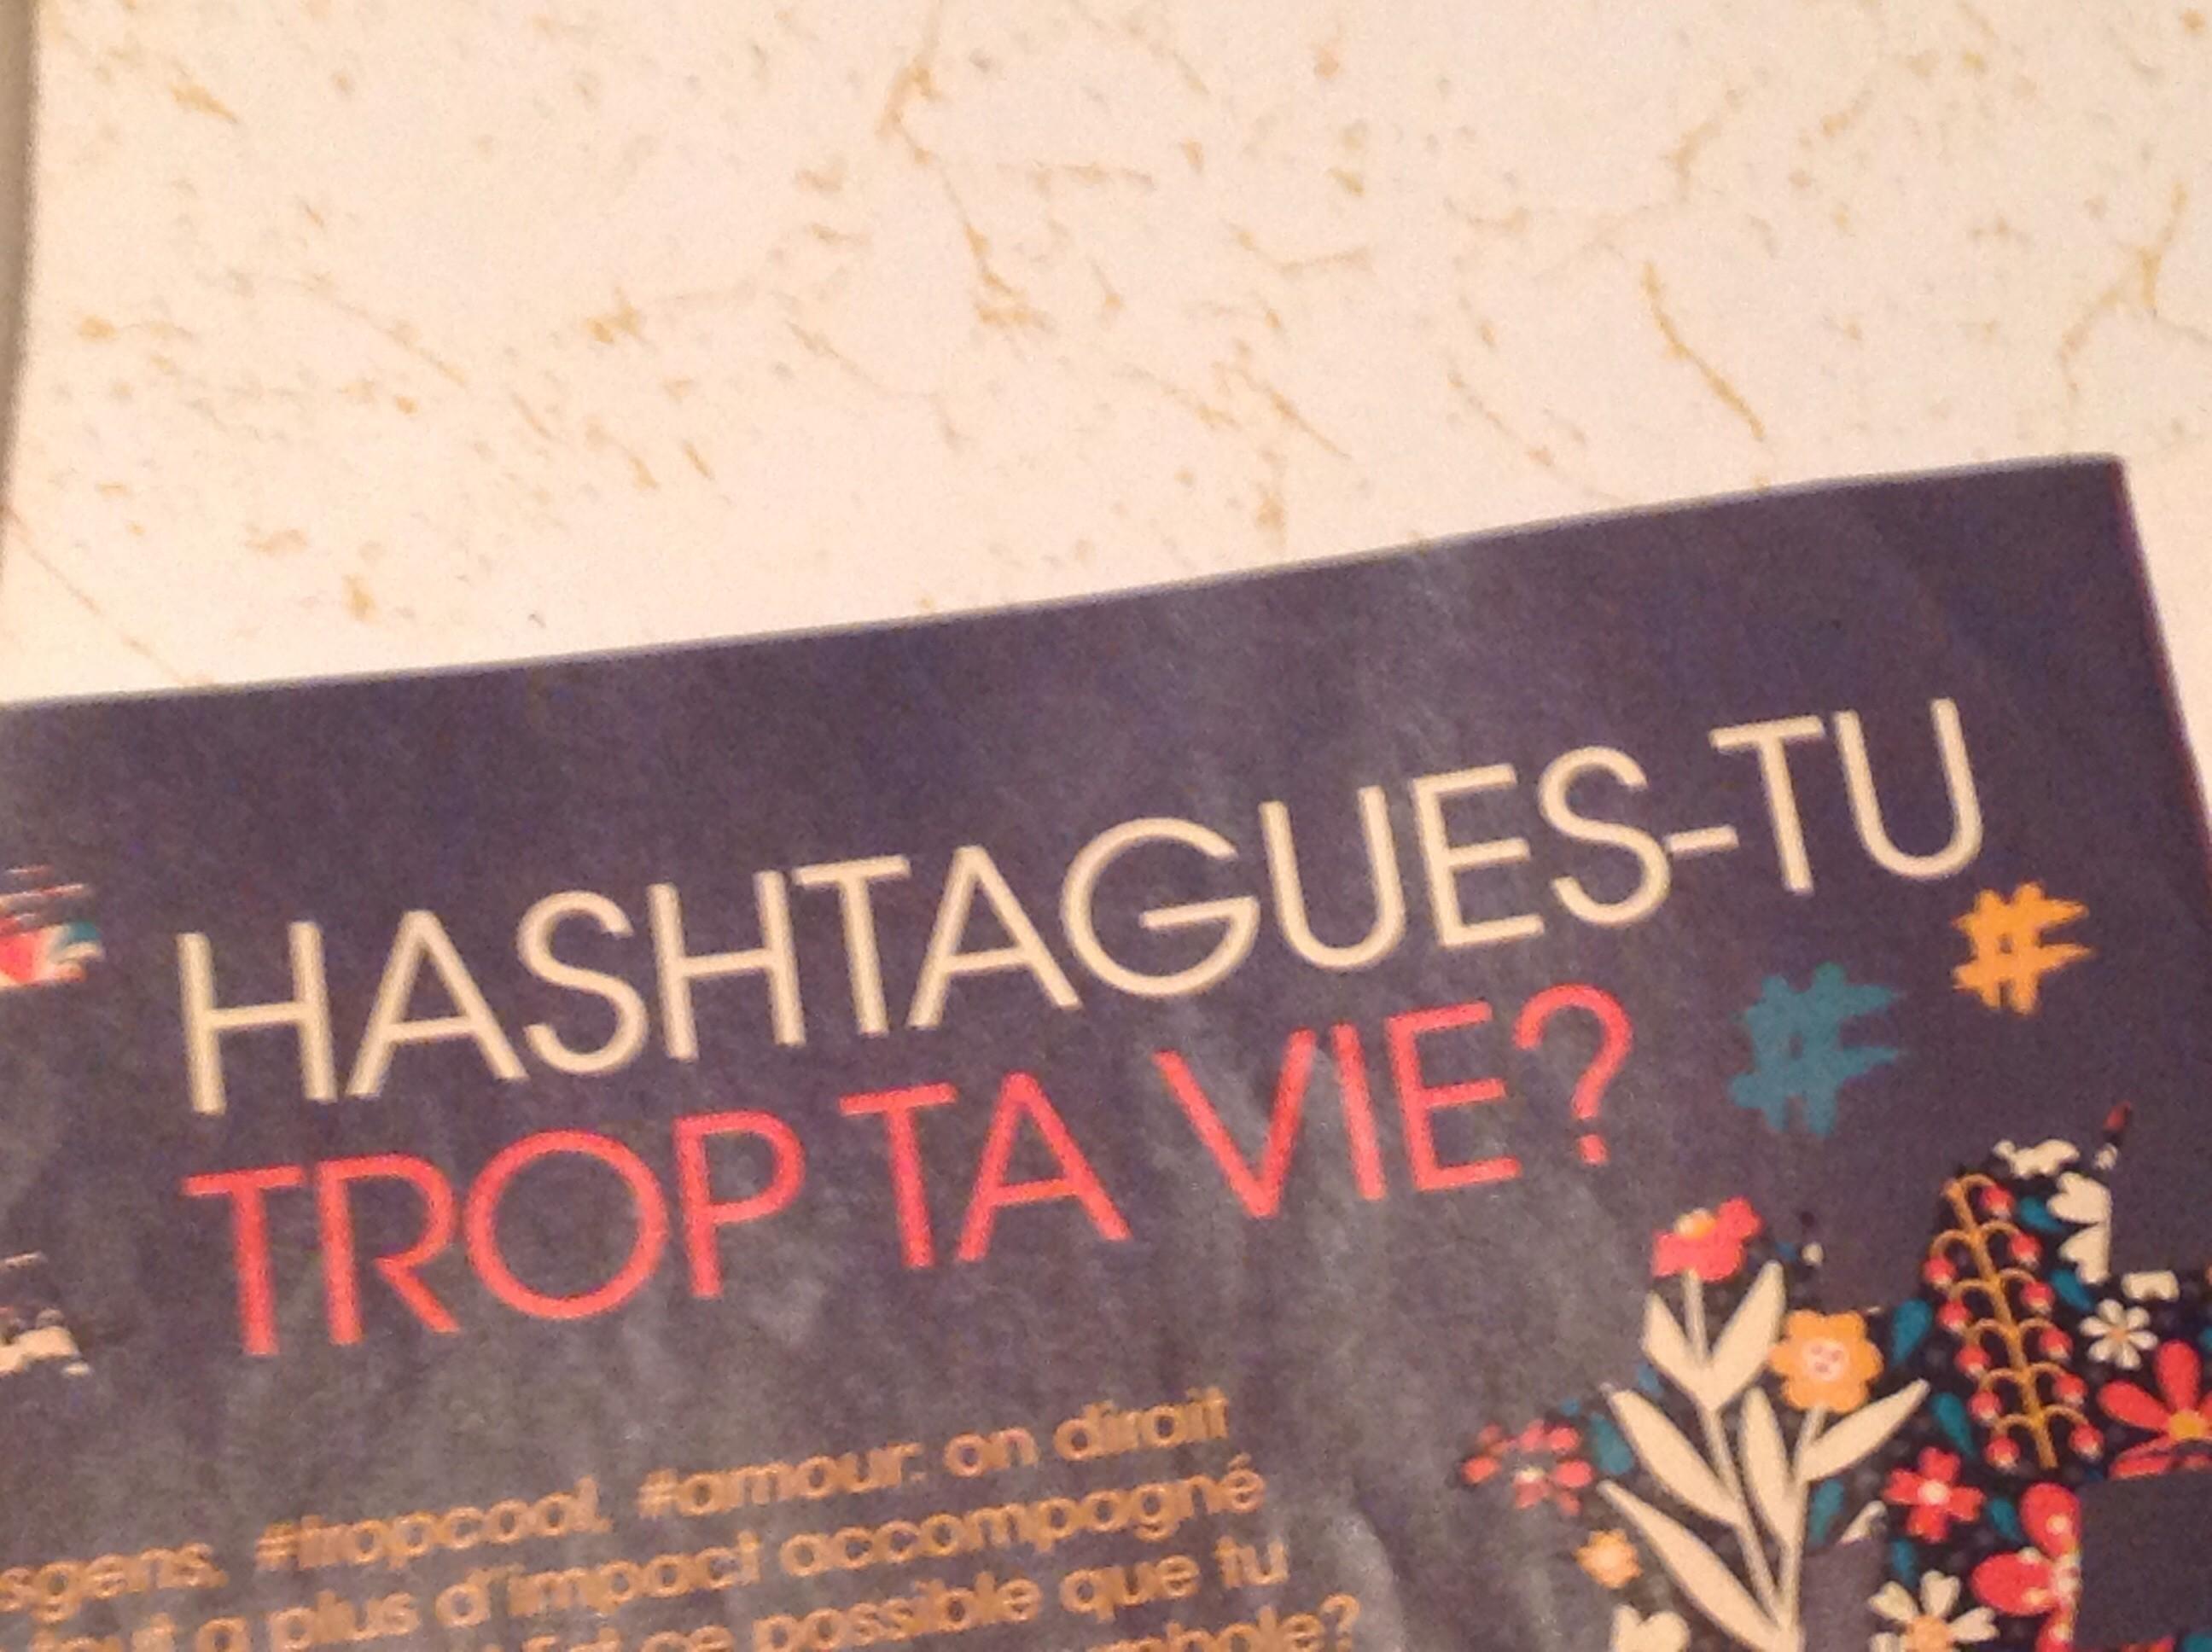 Hashtagues-tu trop ta vie ?